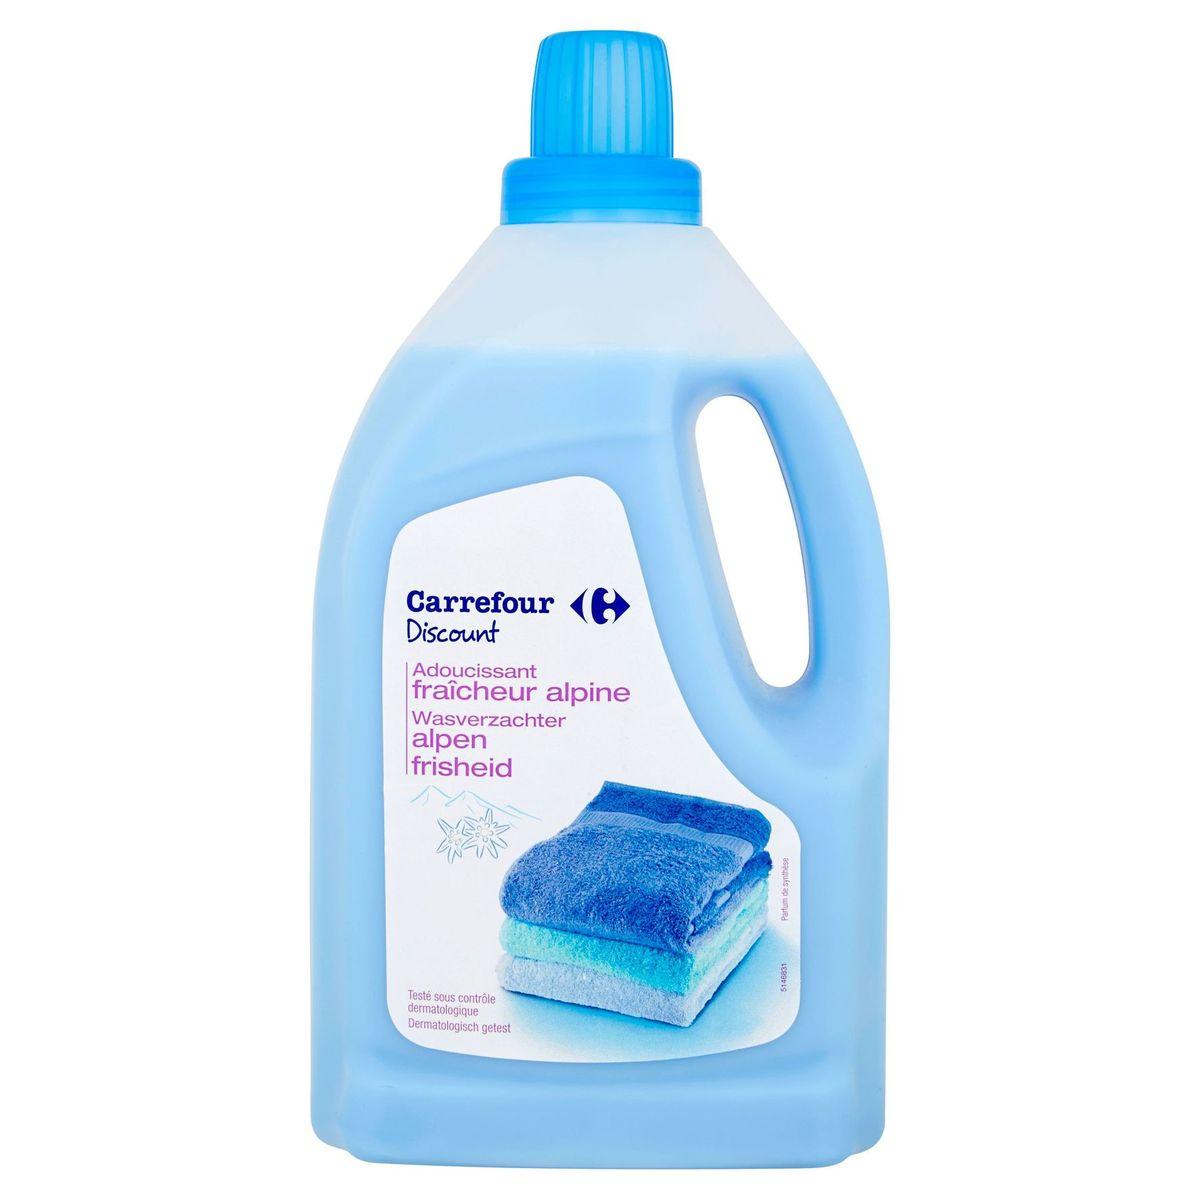 Carrefour Discount wasverzachter alpen frisheid 1.5 L